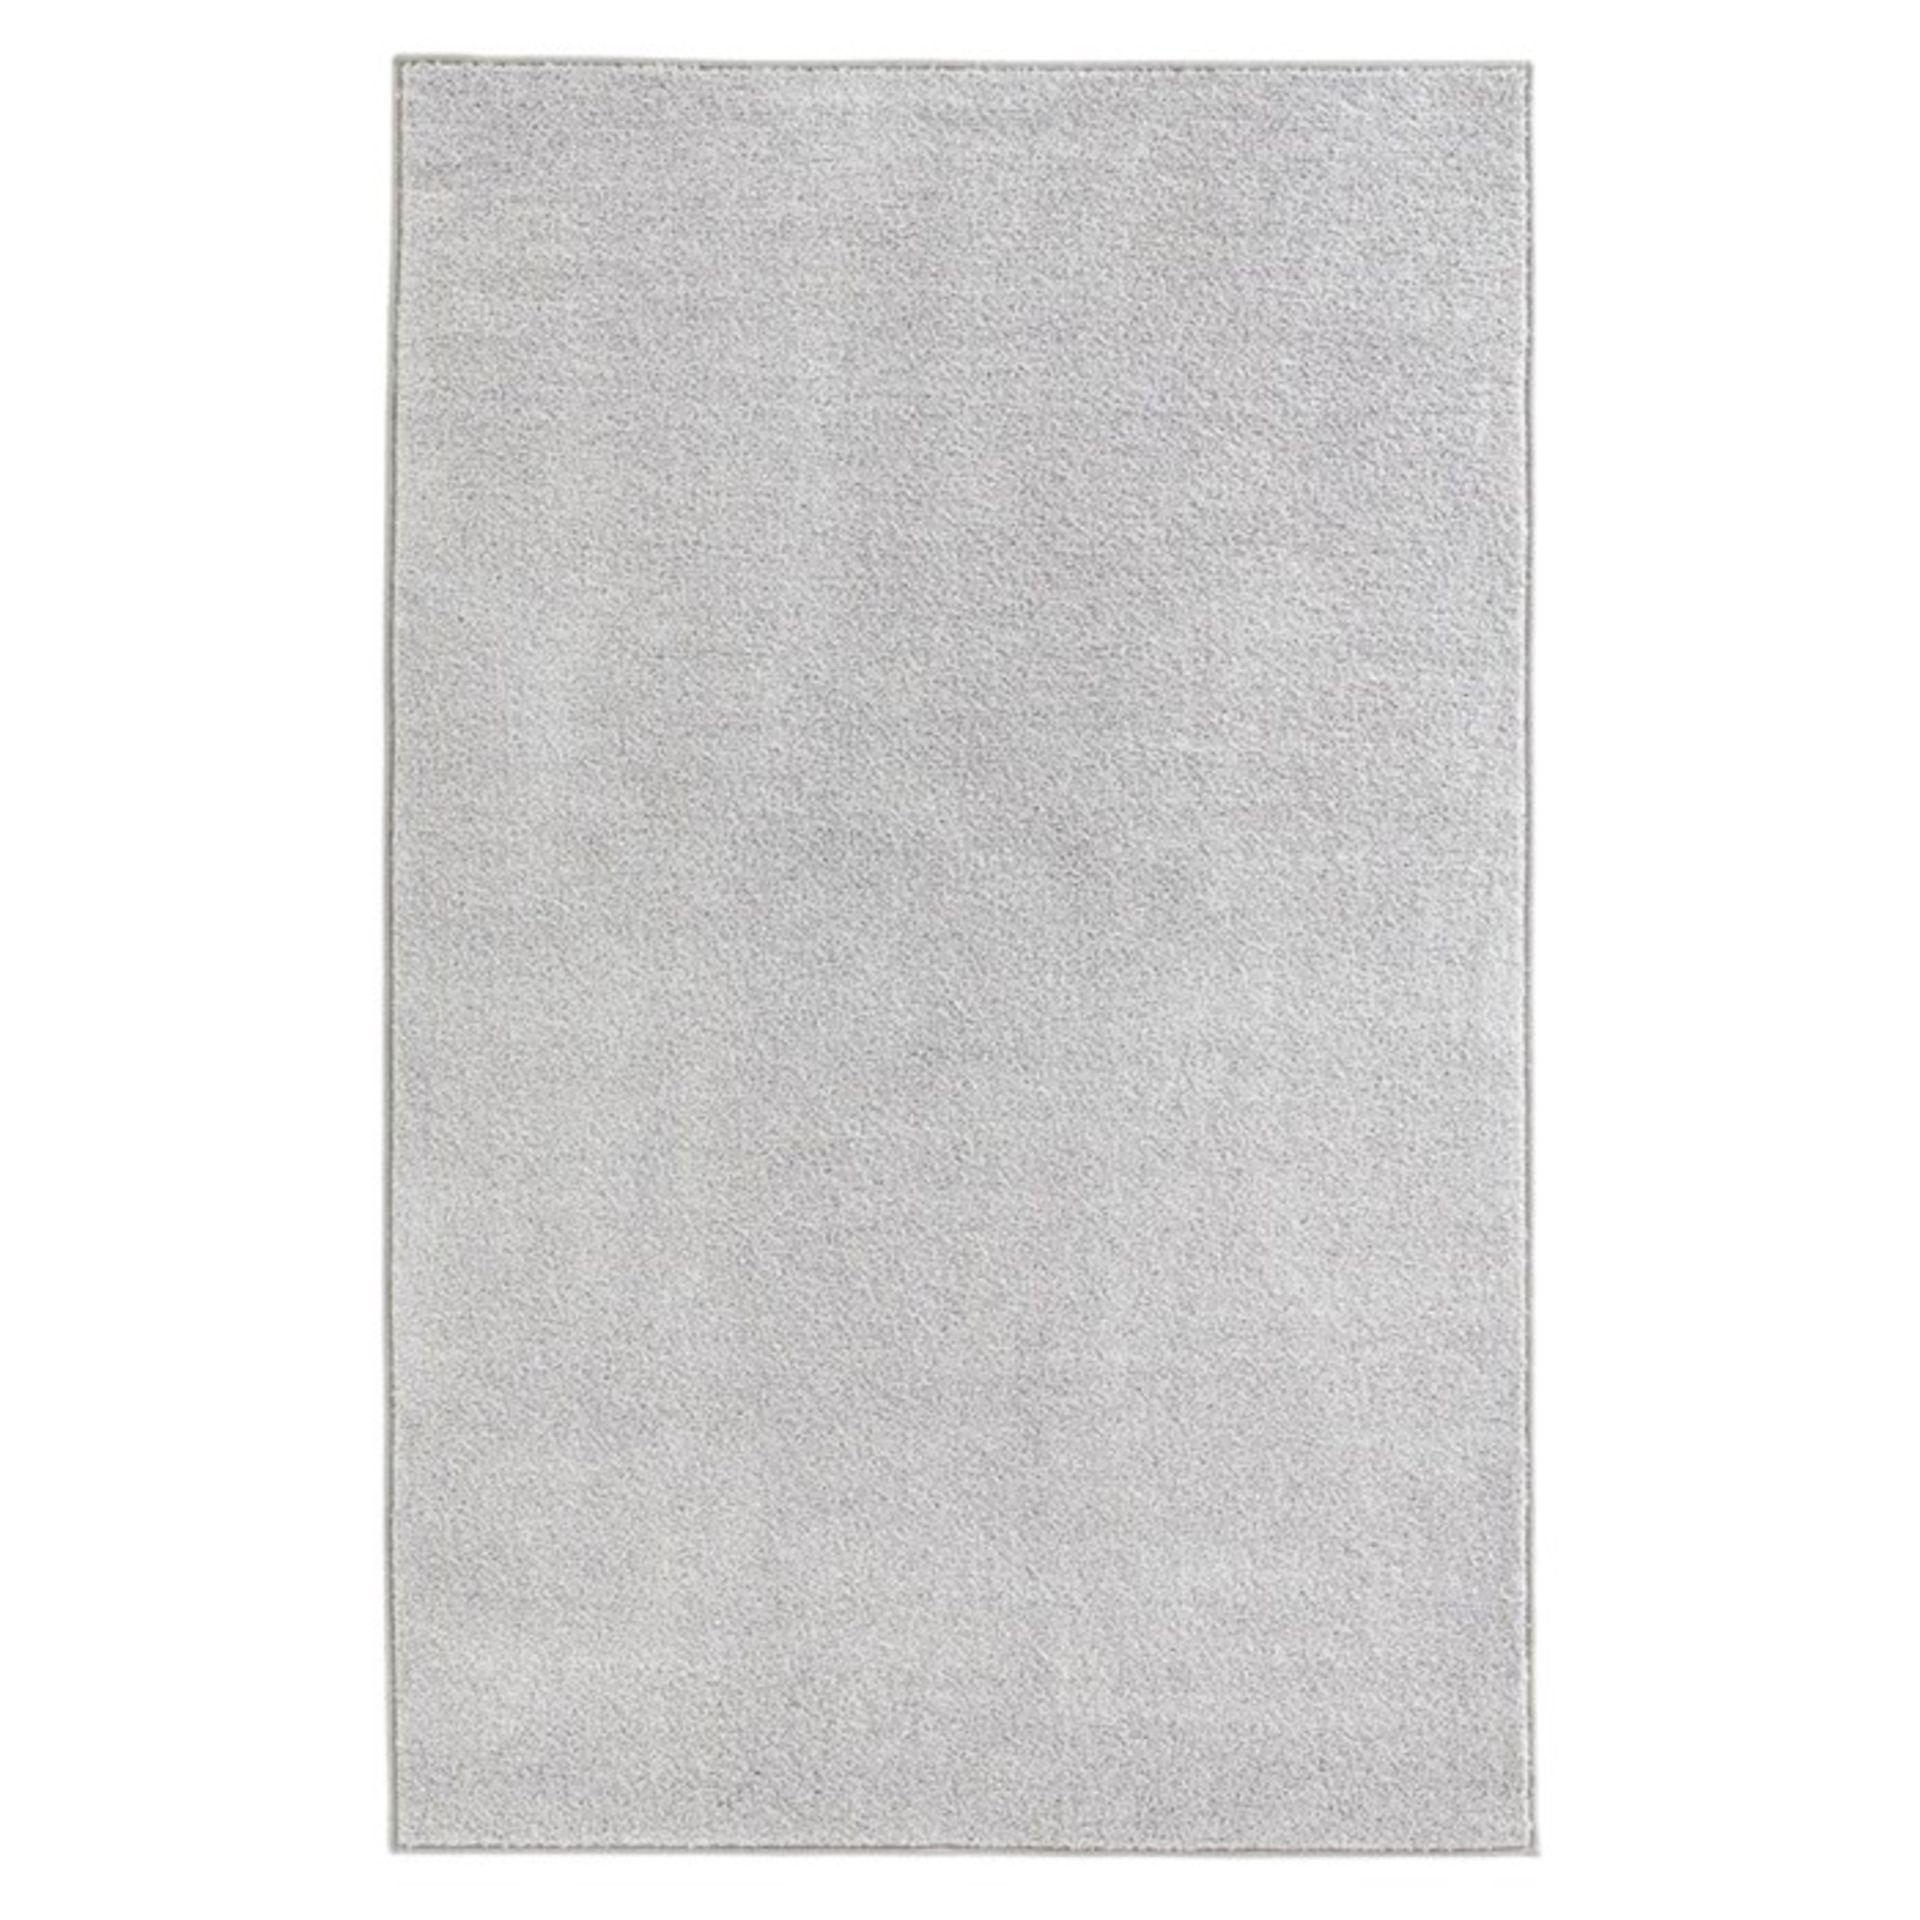 Hanse Home,Pure Grey Rug RRP -£ 29.99(18267/42 -HEHM1483)